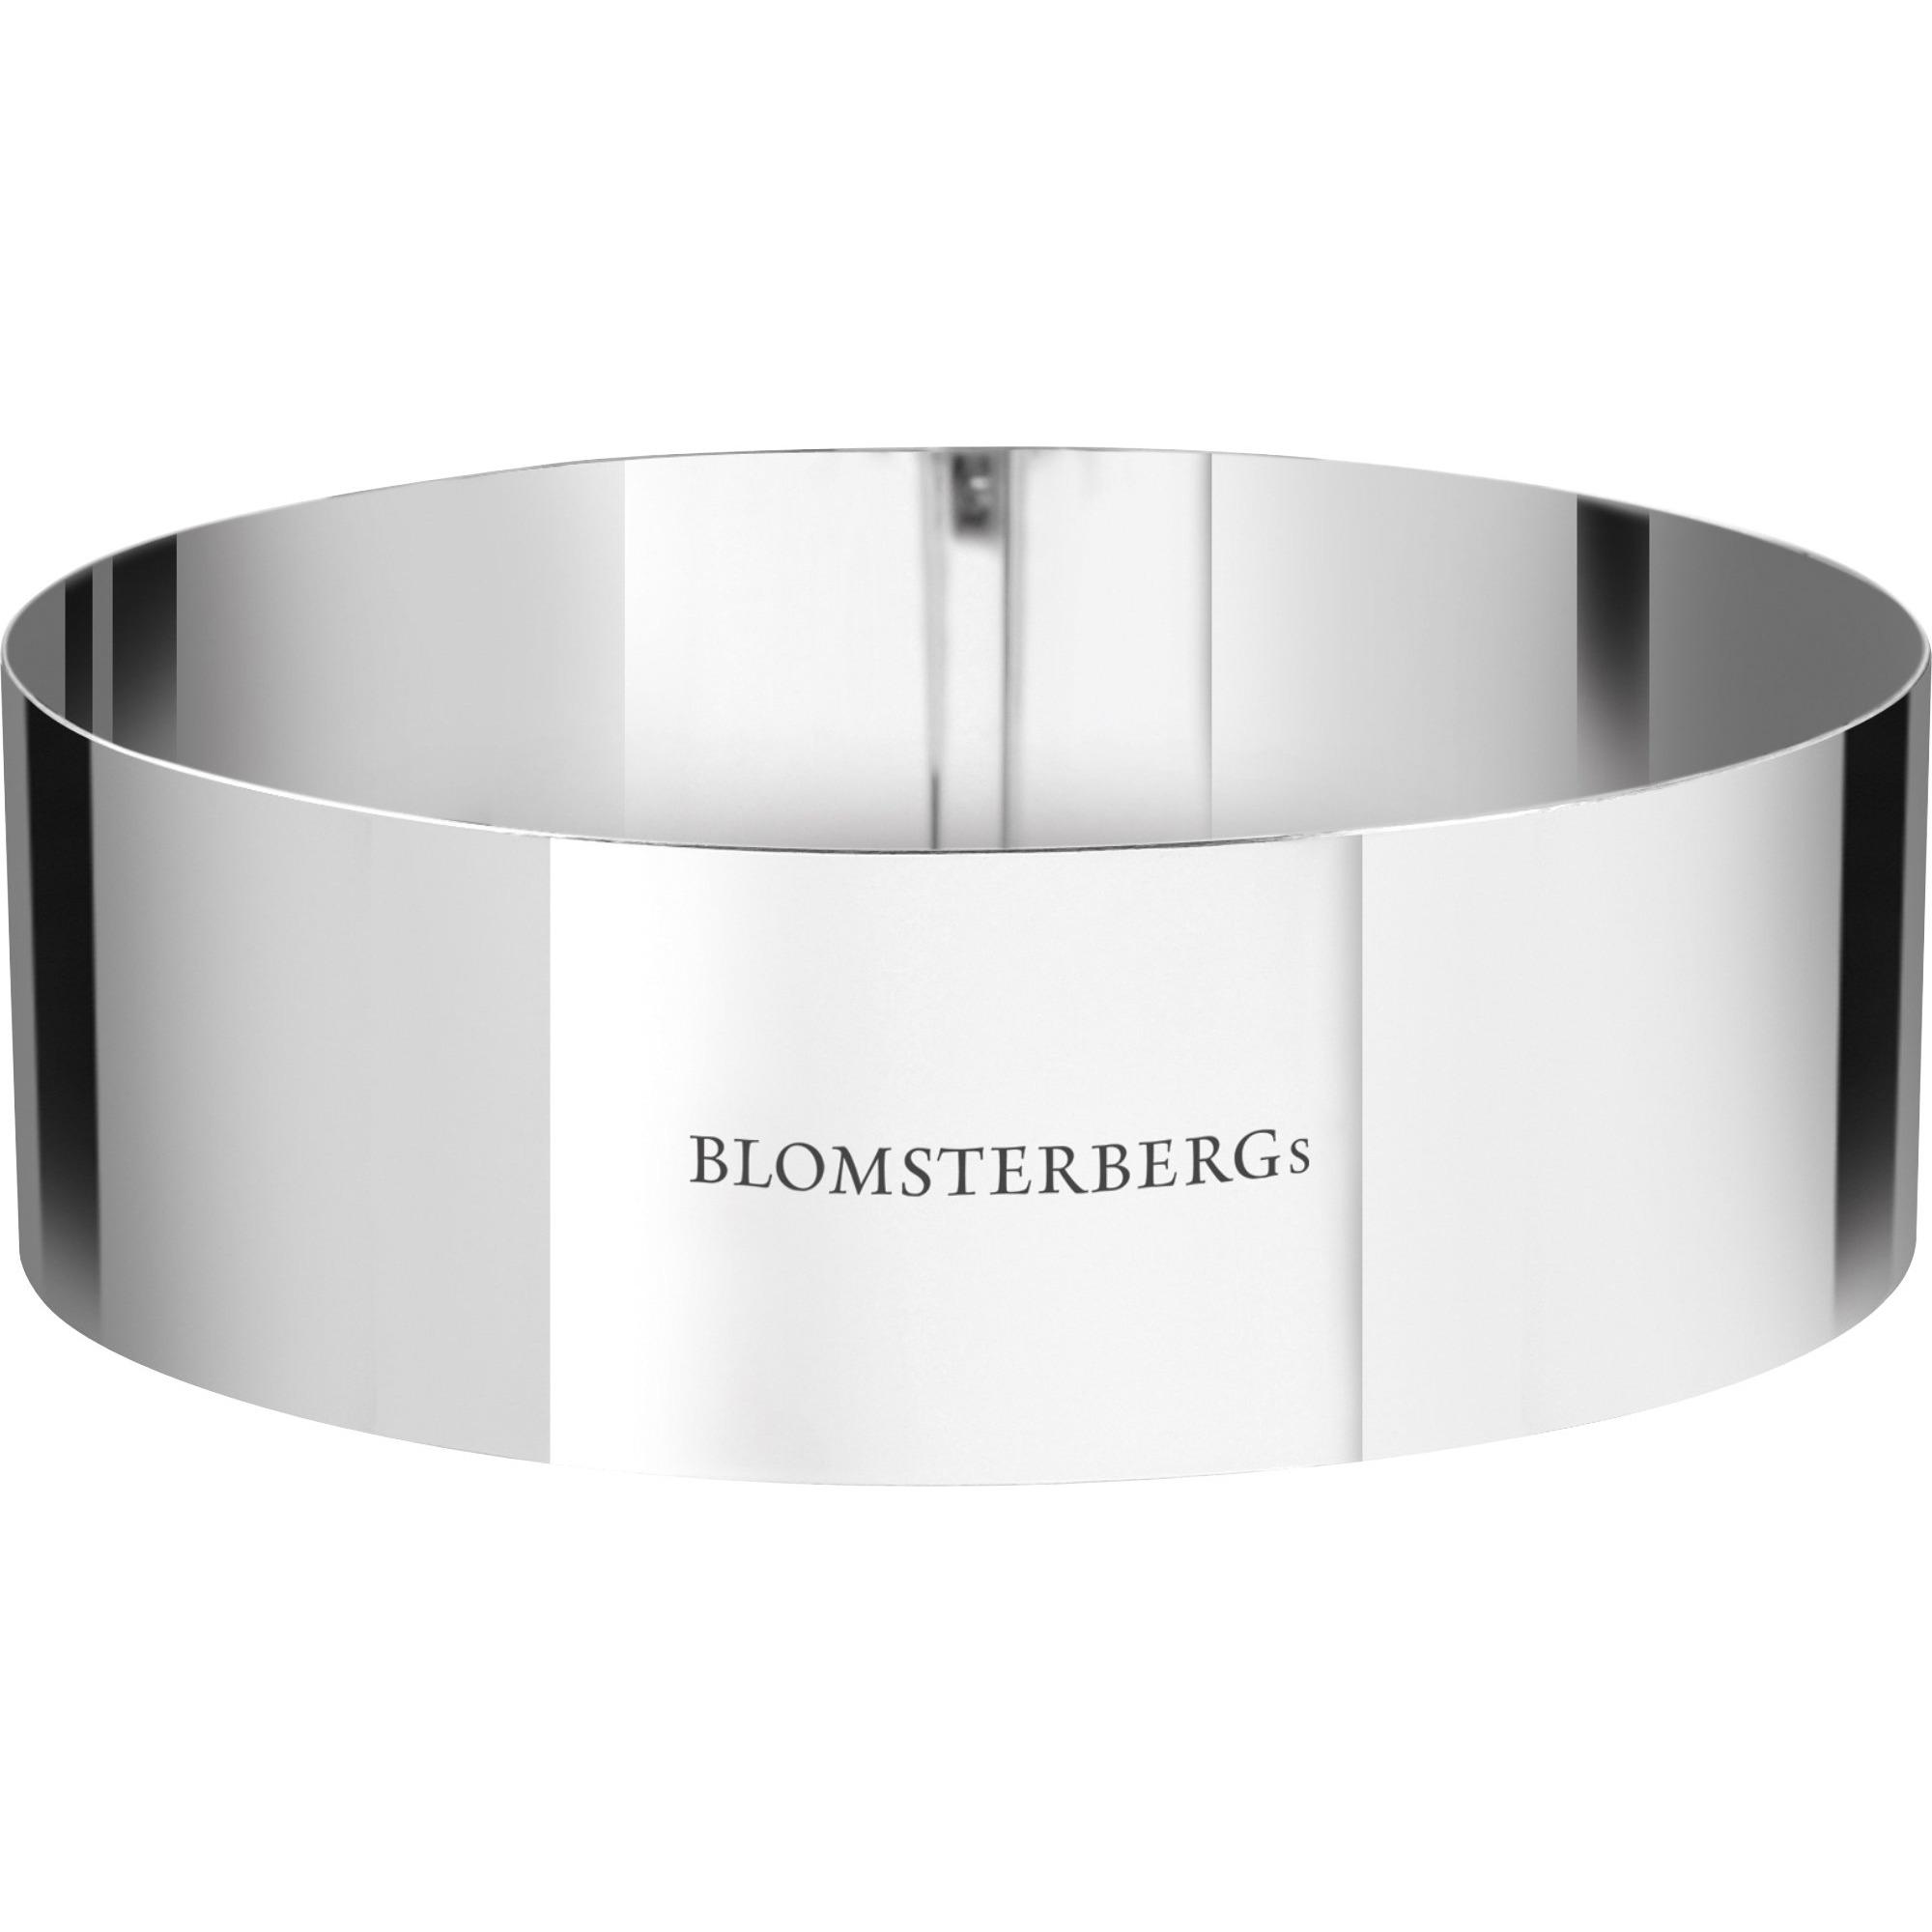 Blomsterbergs Tårtring 16 cm Rostfri